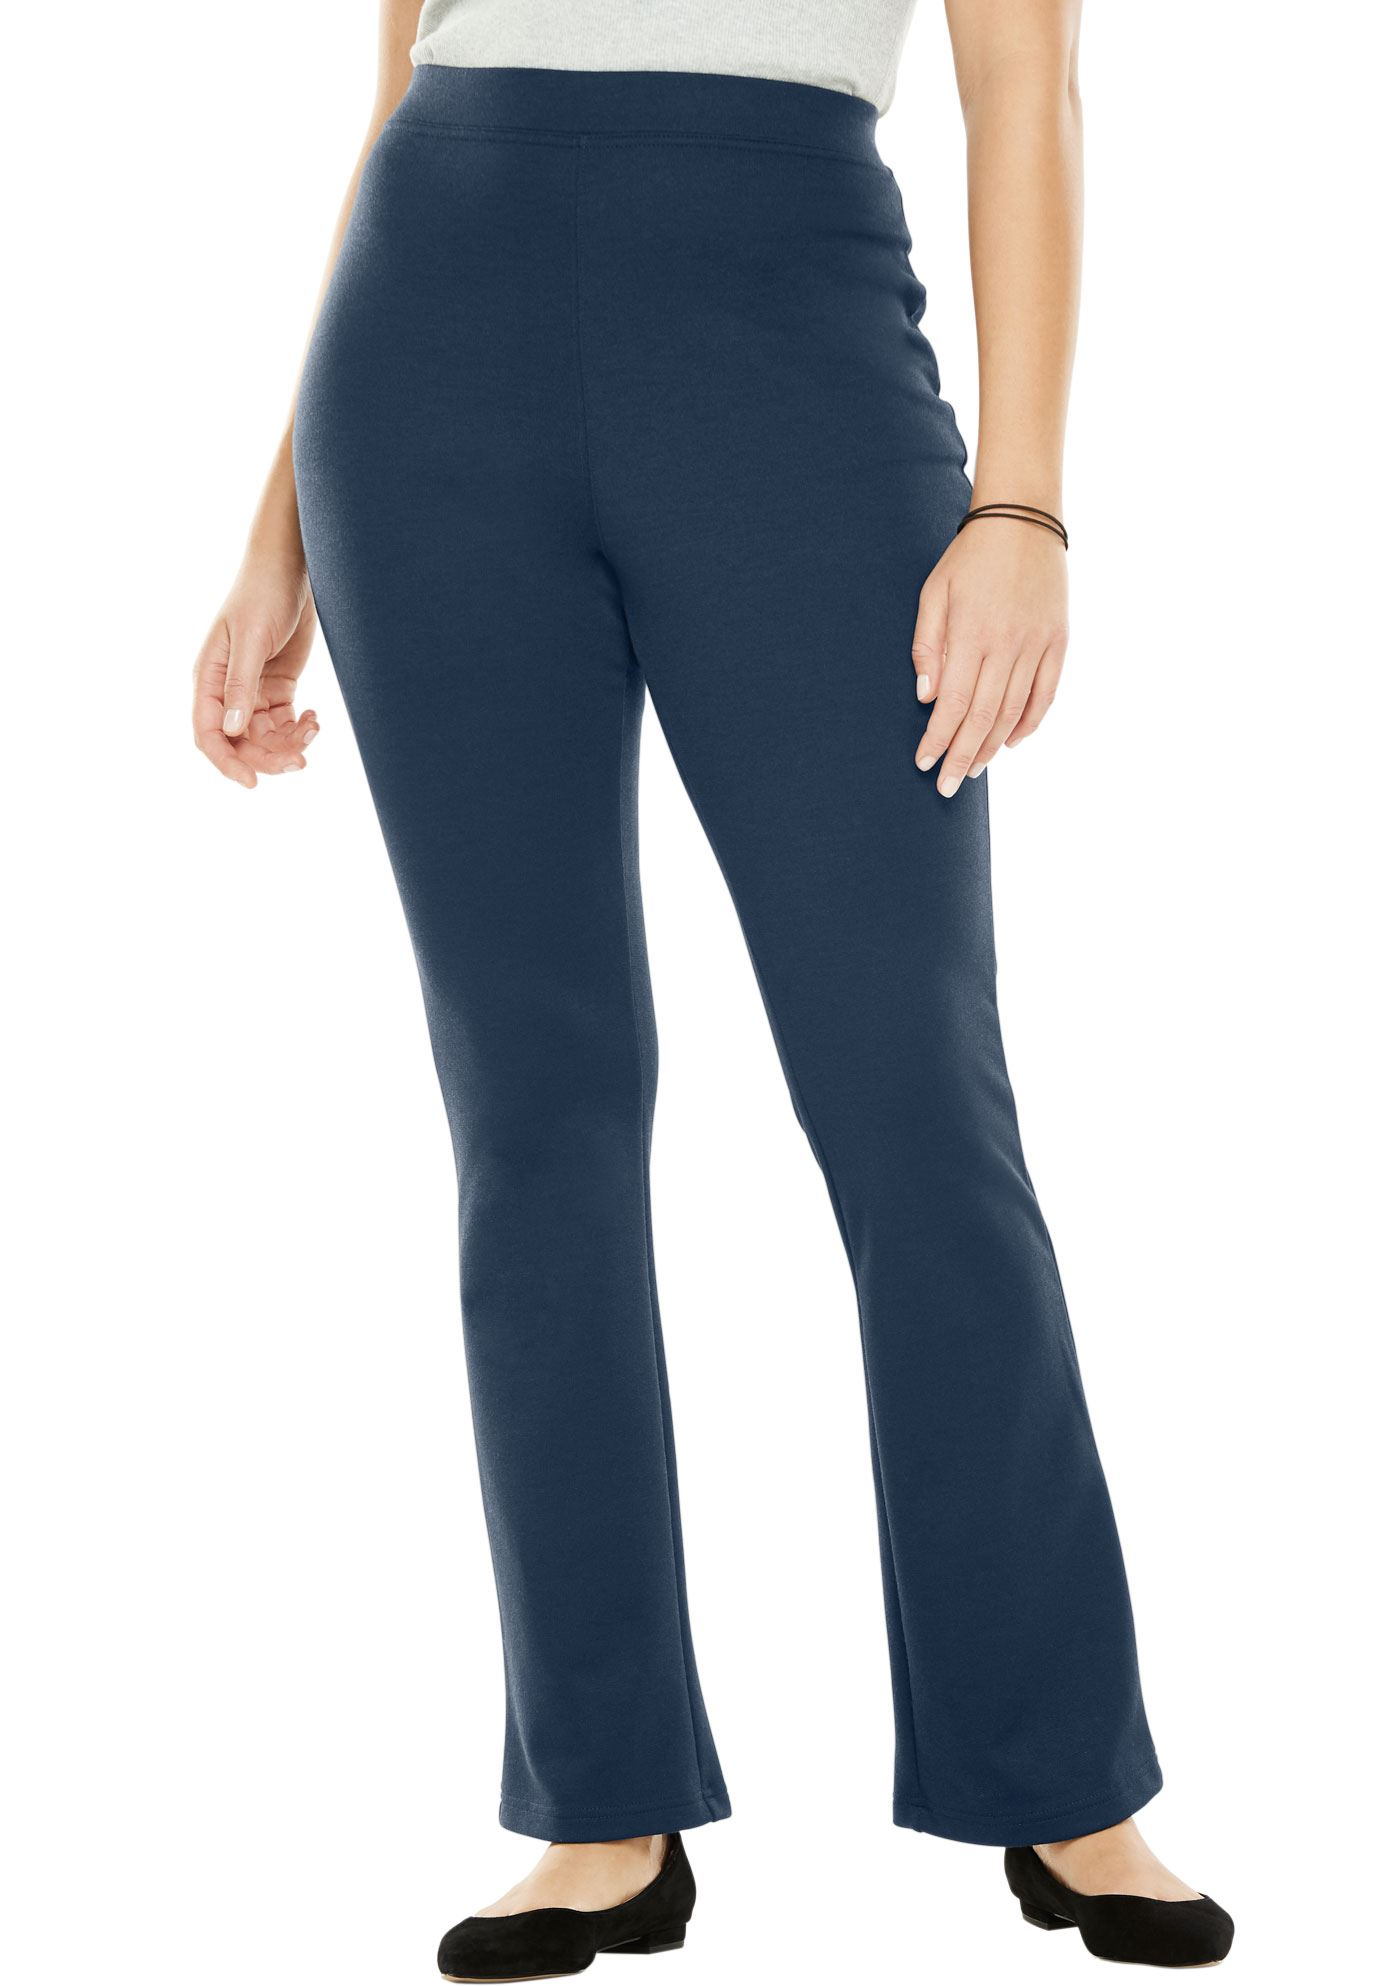 Woman Within Plus Size Petite Bootcut Ponte Stretch Knit Pant